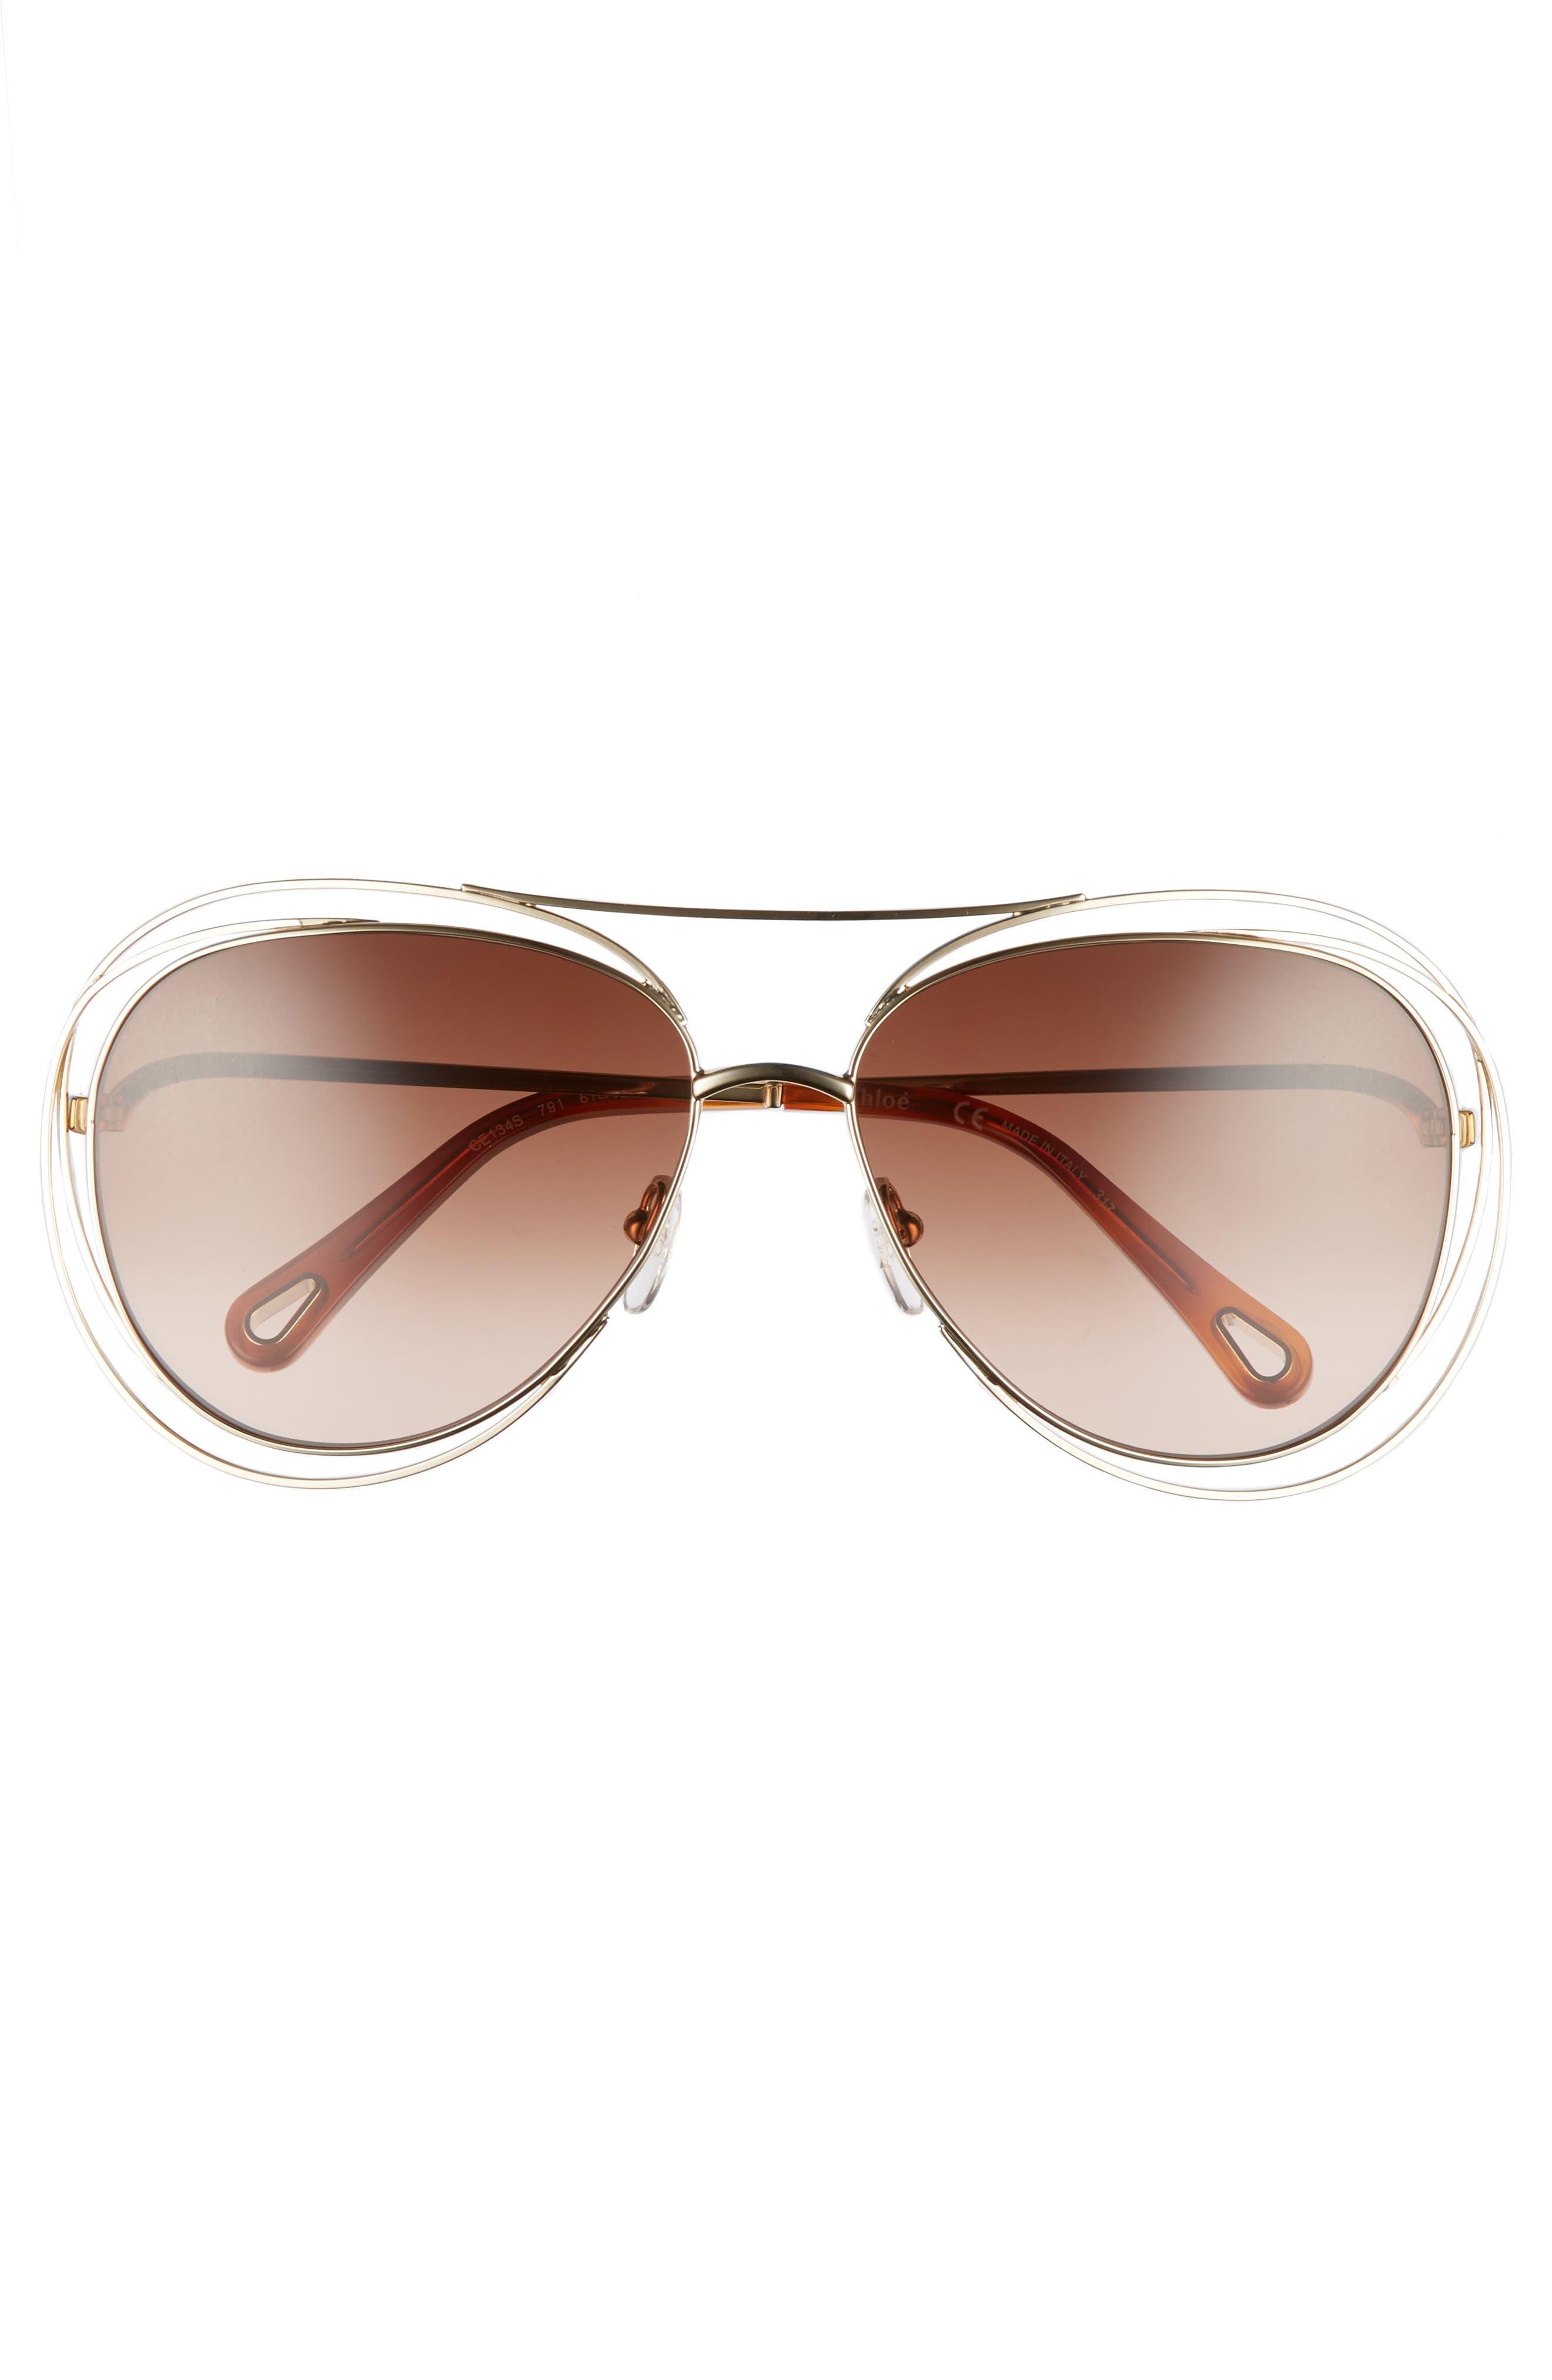 61mm Aviator Sunglasses,                             Alternate thumbnail 3, color,                             Gold/ Havana